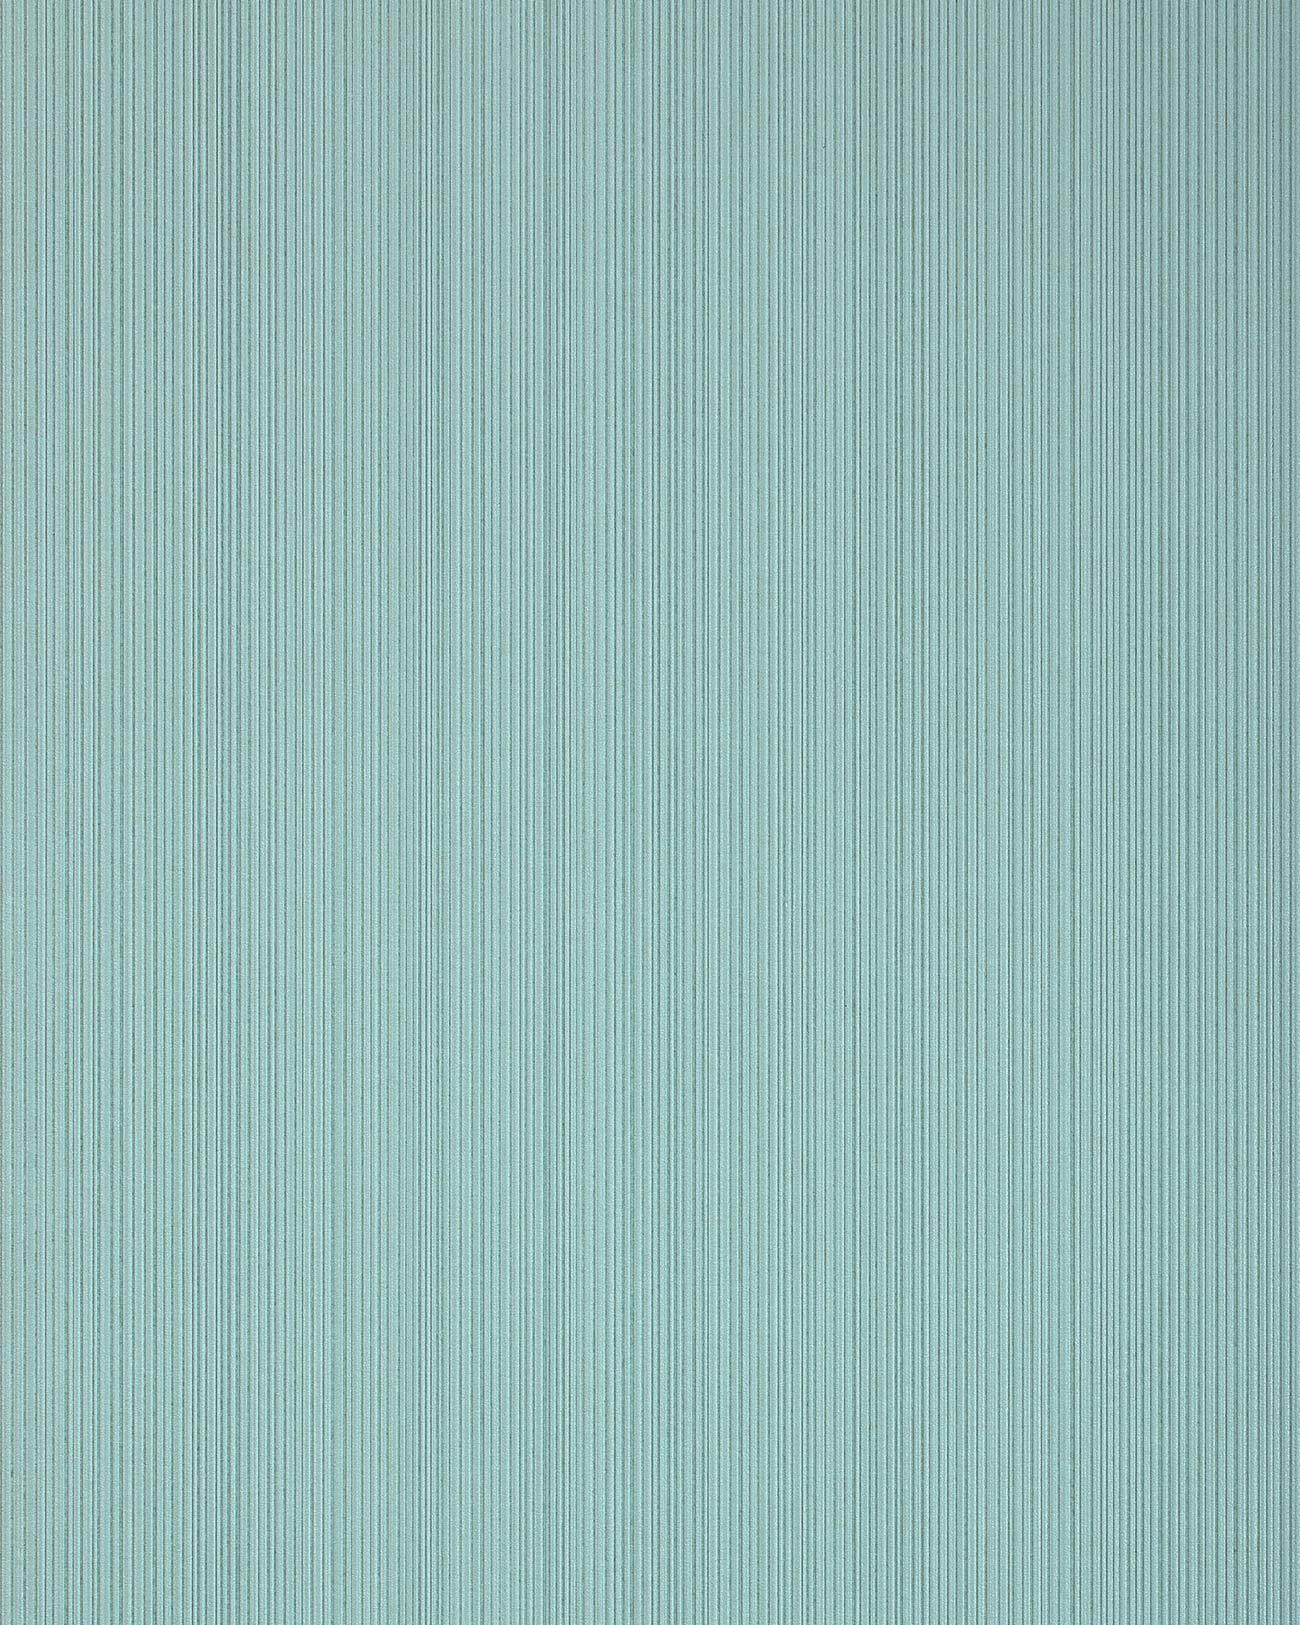 Stripes Wallpaper Wall Covering EDEM 557 15 Blown Vinyl Wallcovering Textured Fabric Look Matt Turquoise Teal Pastel Mint 533 M2 57